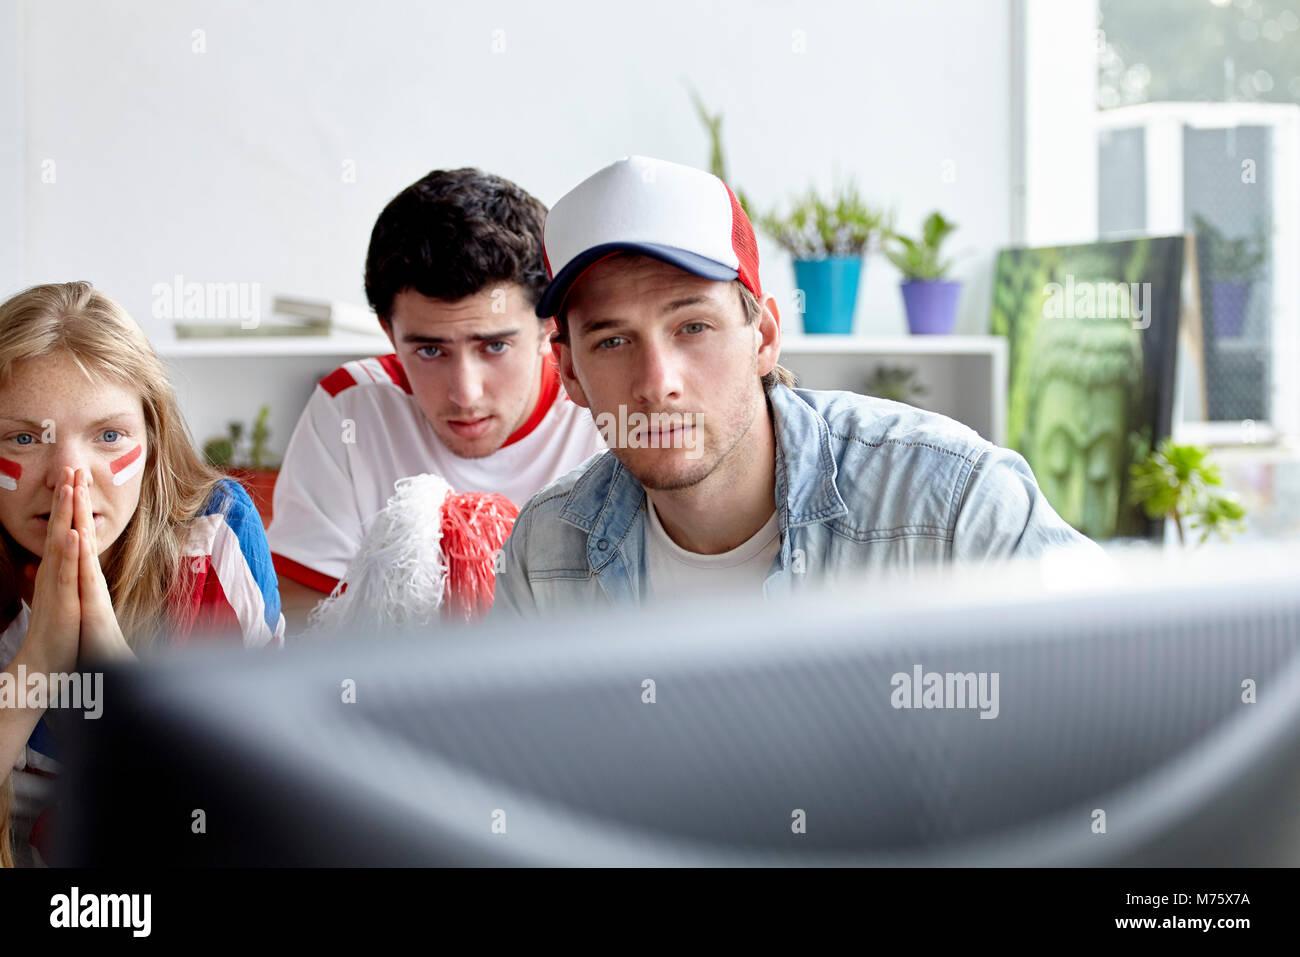 Sportbegeisterte beobachten Match auf TV zu Hause Stockbild